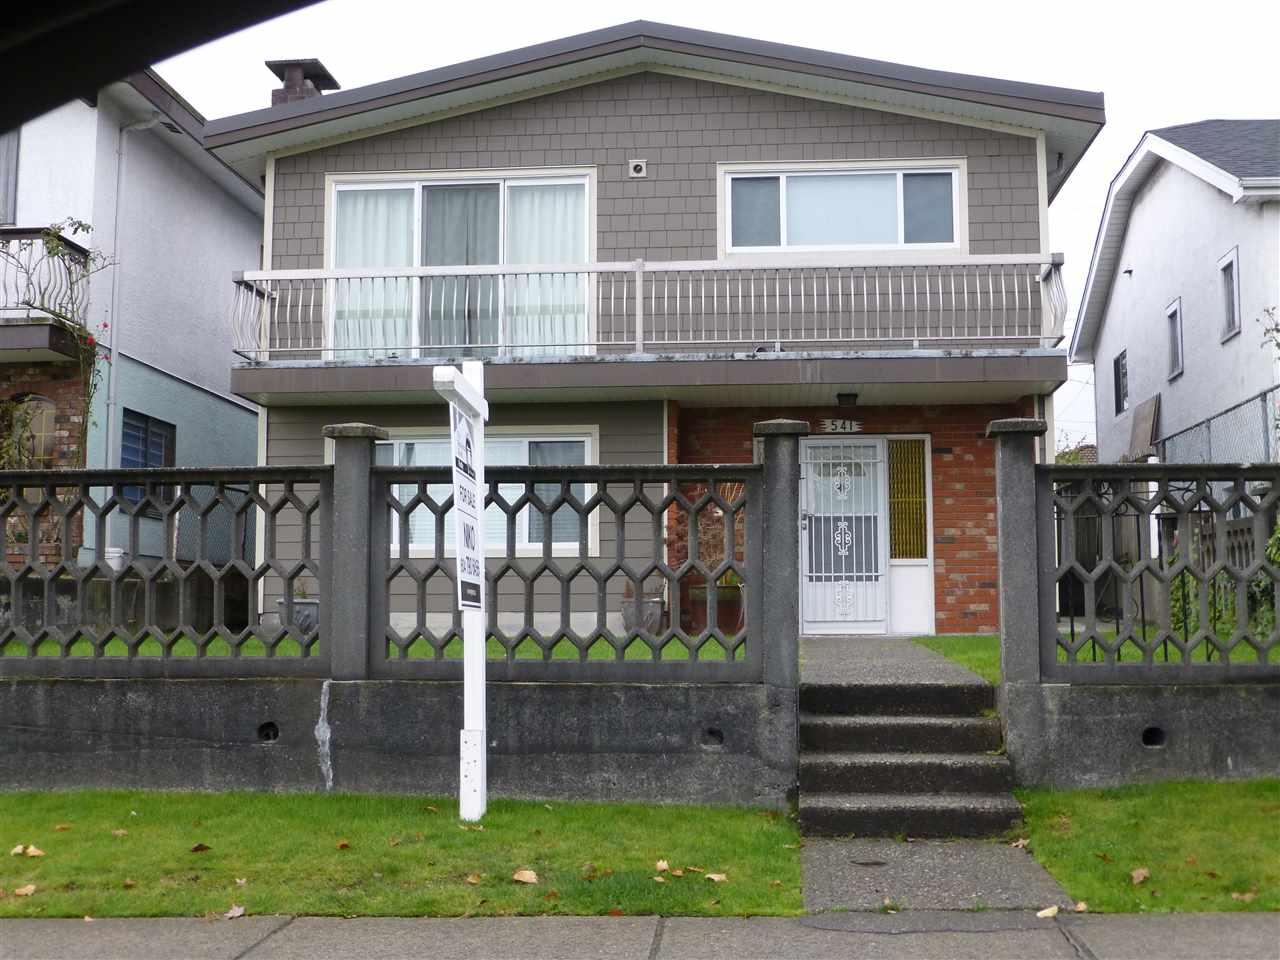 541 RENFREW STREET, Vancouver, BC V5K 4B2